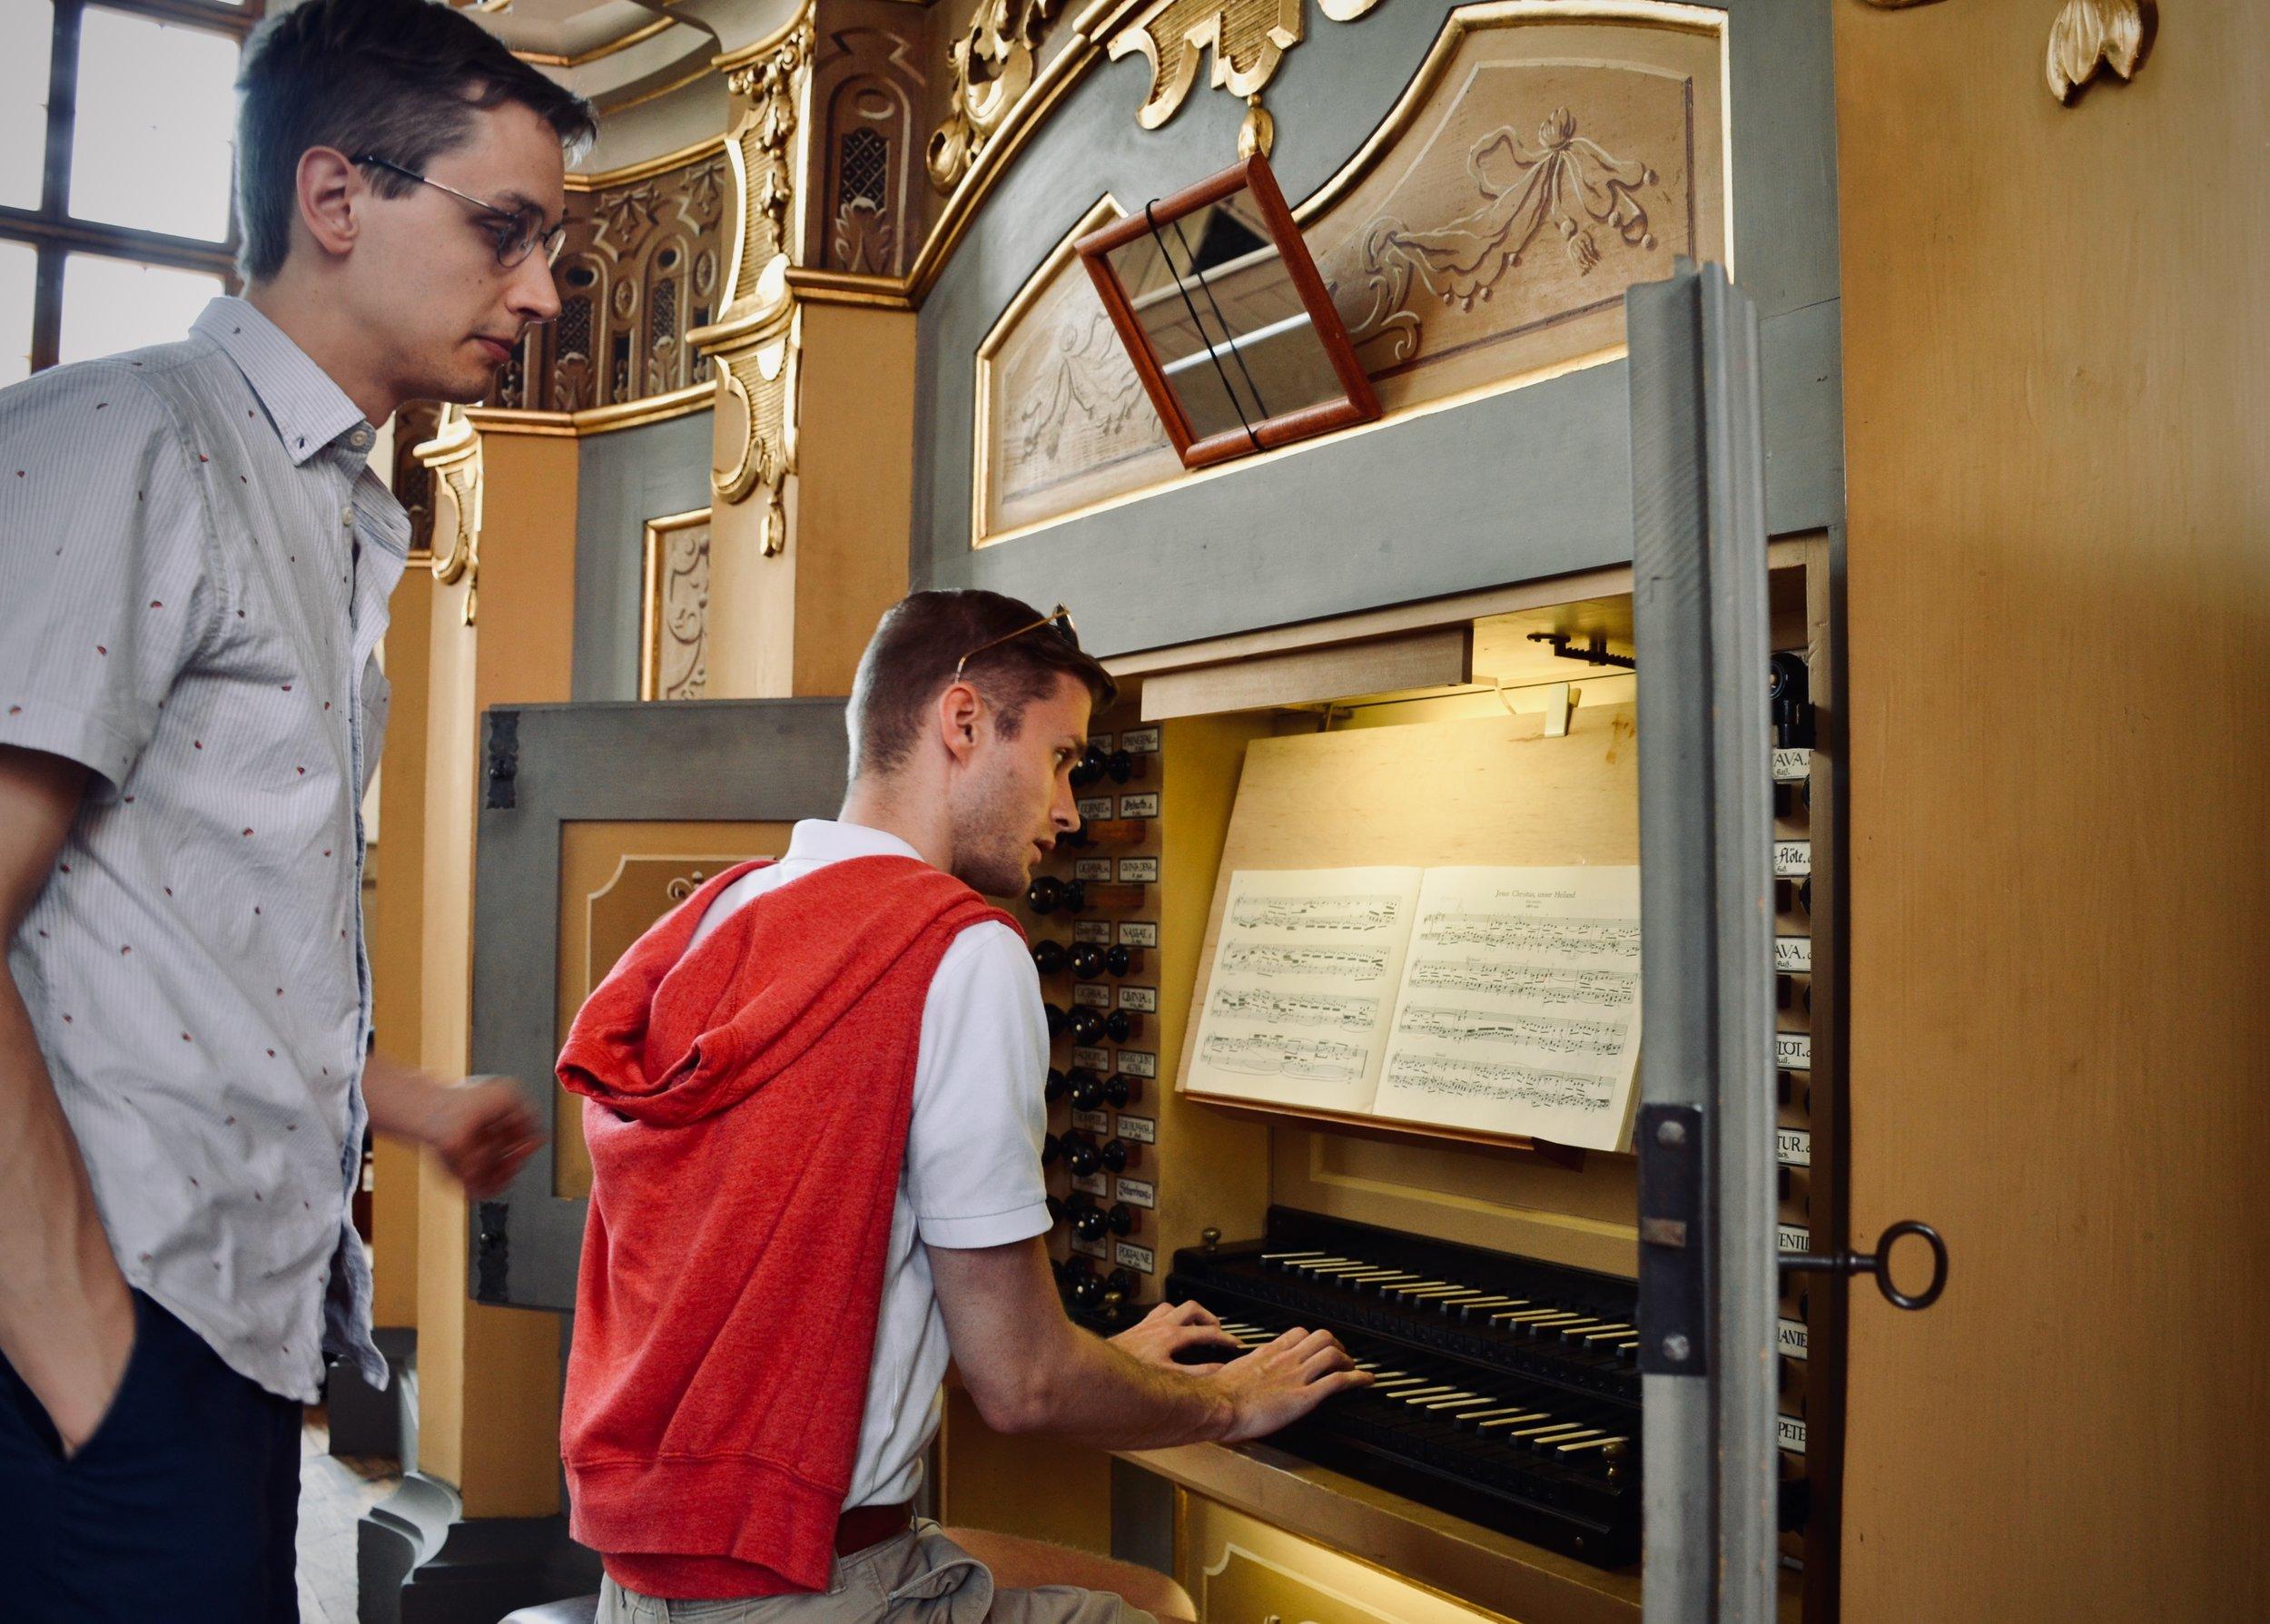 Evan Currie plays the 1735 Gottfried Silbermann organ, St. Petrikirche, Freiberg.